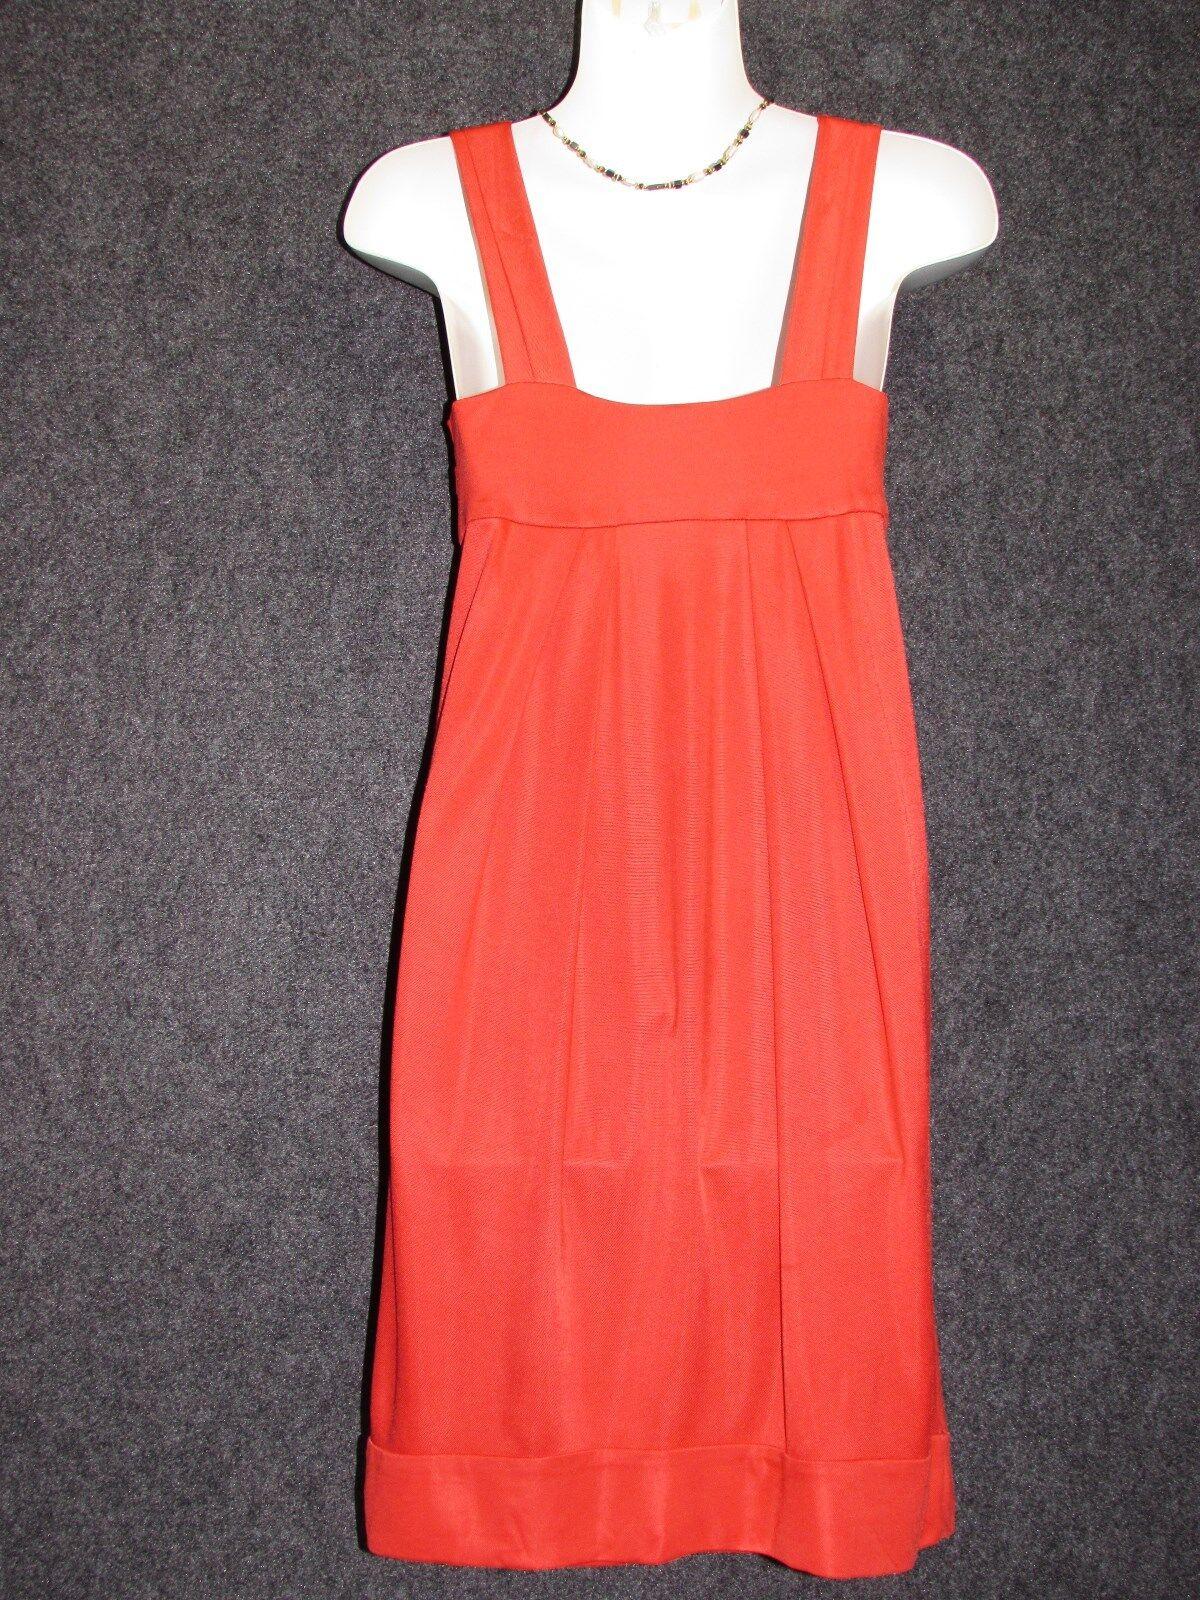 DIANE Von FURSTENBERG Poppy Red Sleeveless Dress Dress Dress SZ 0 c499b2